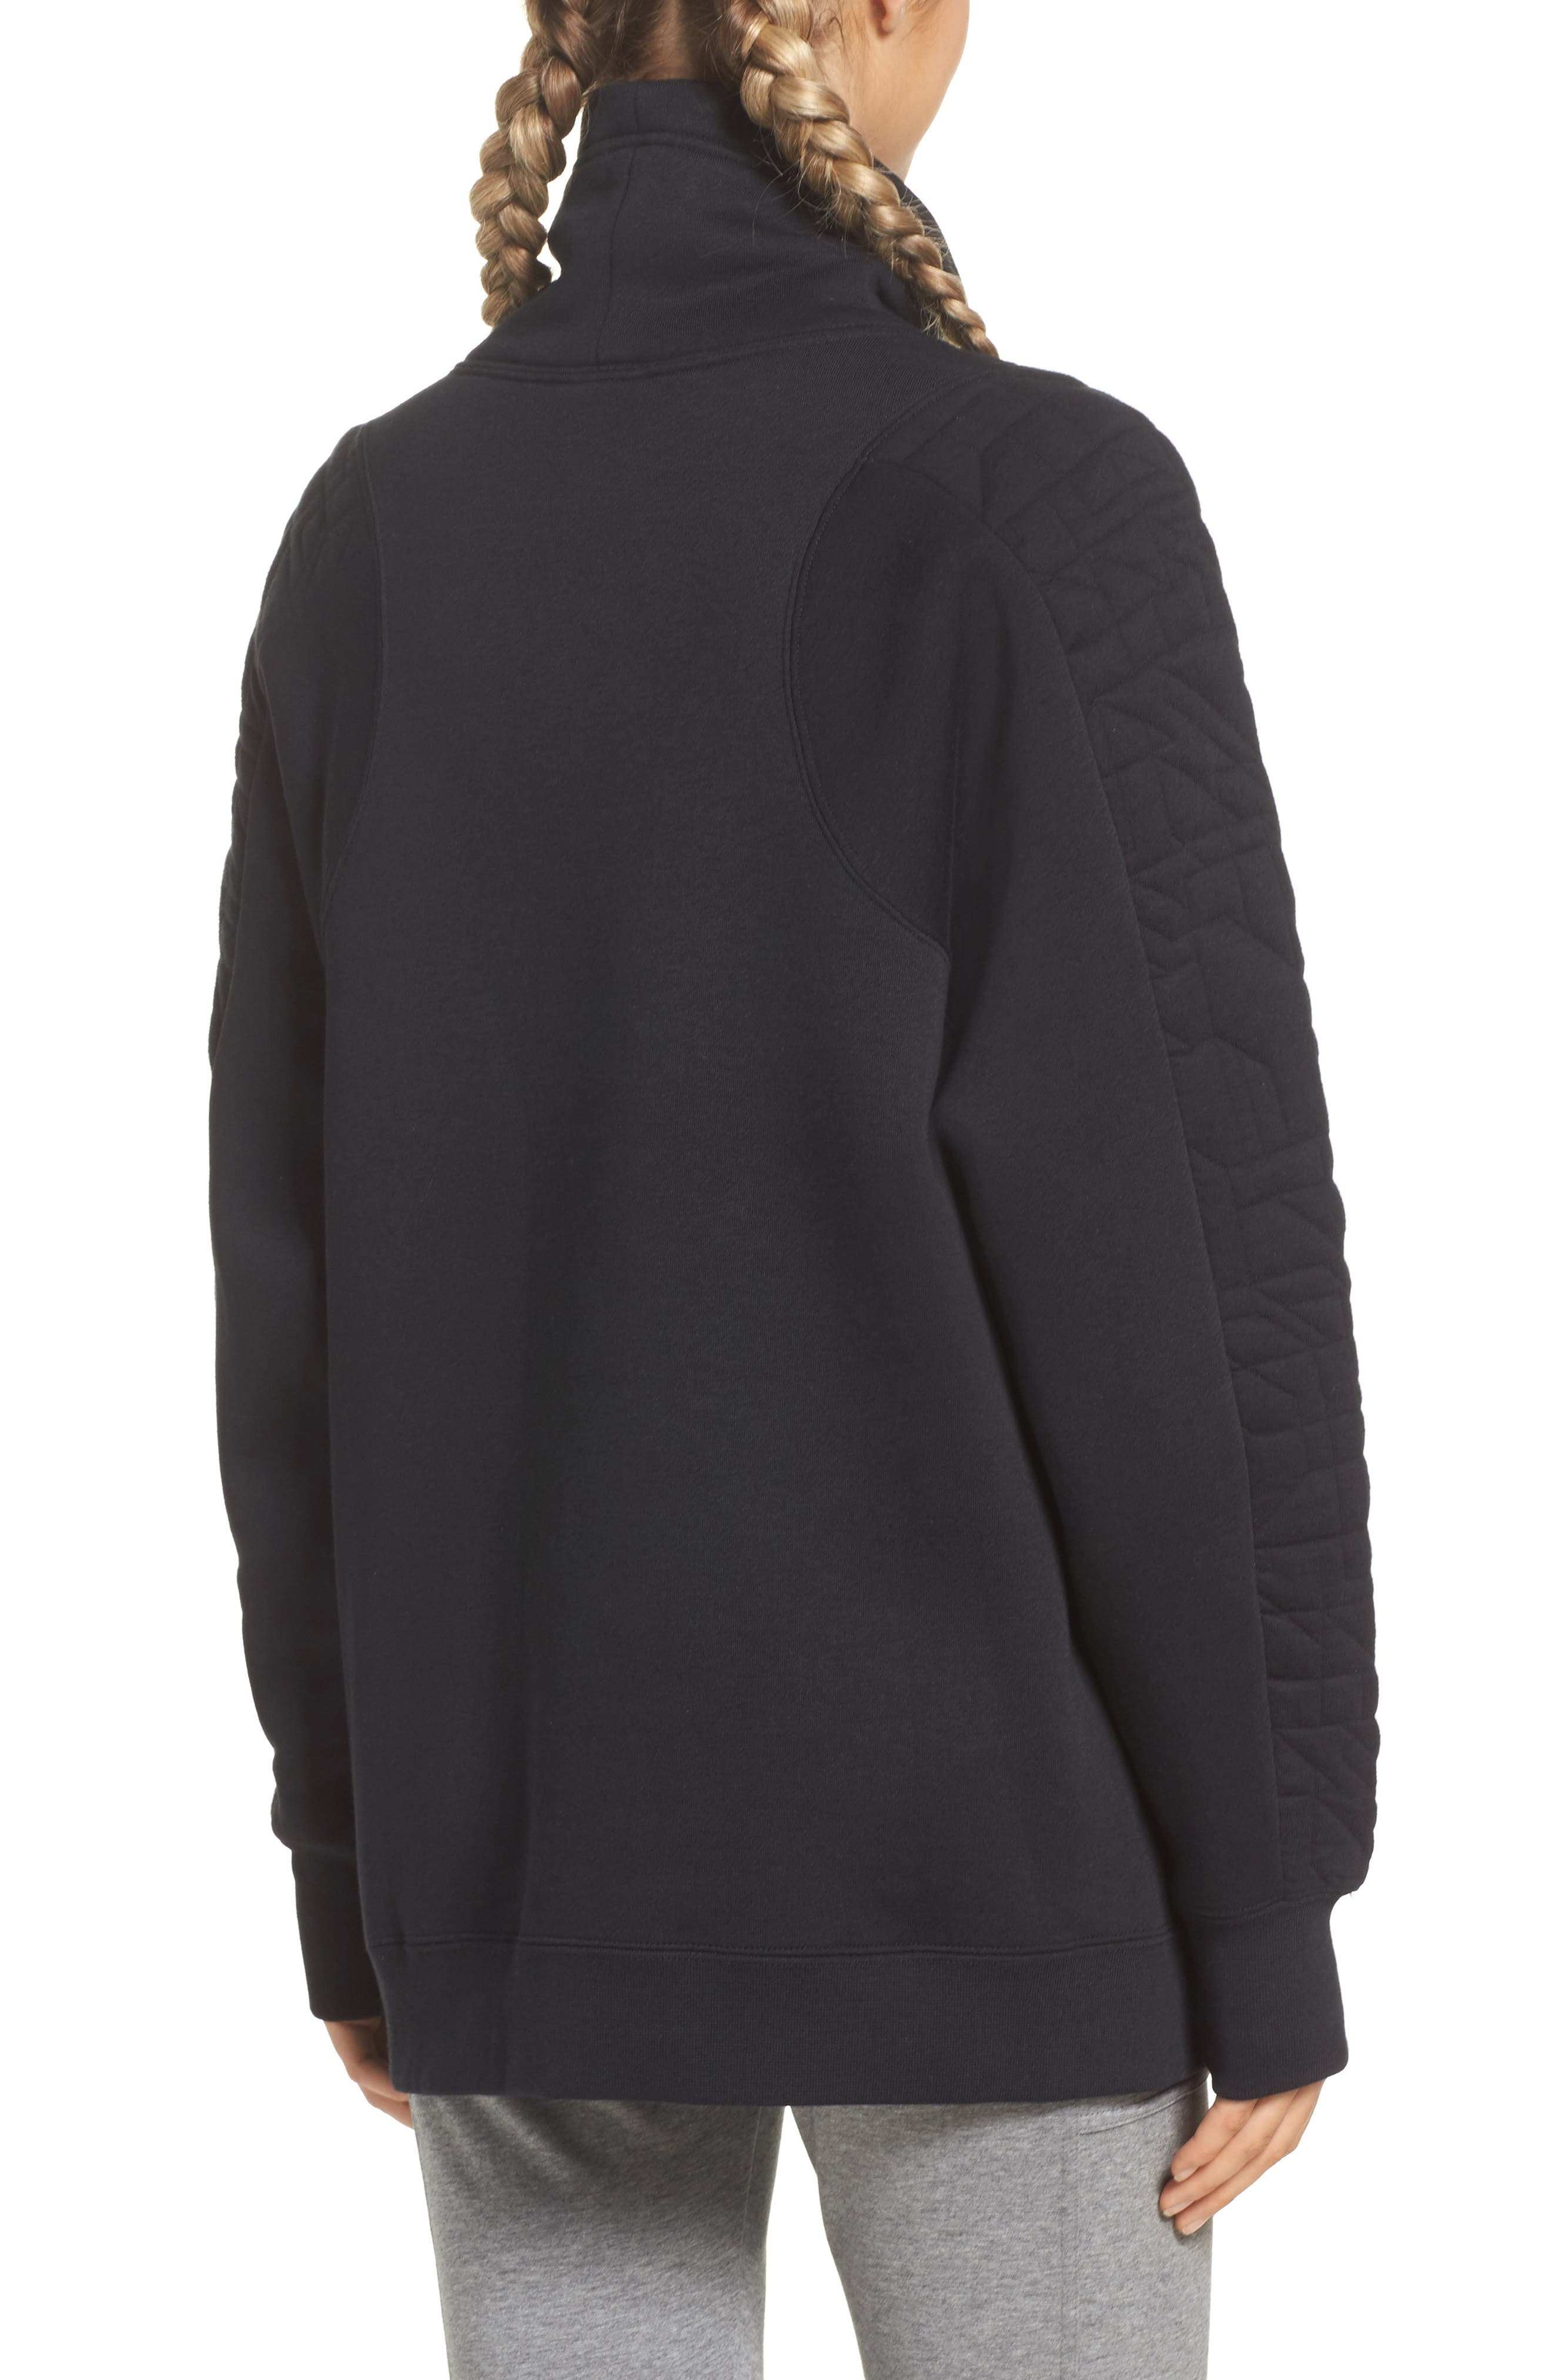 Sportswear Quilted Funnel Neck Pullover,                             Alternate thumbnail 2, color,                             Black/ Light Bone